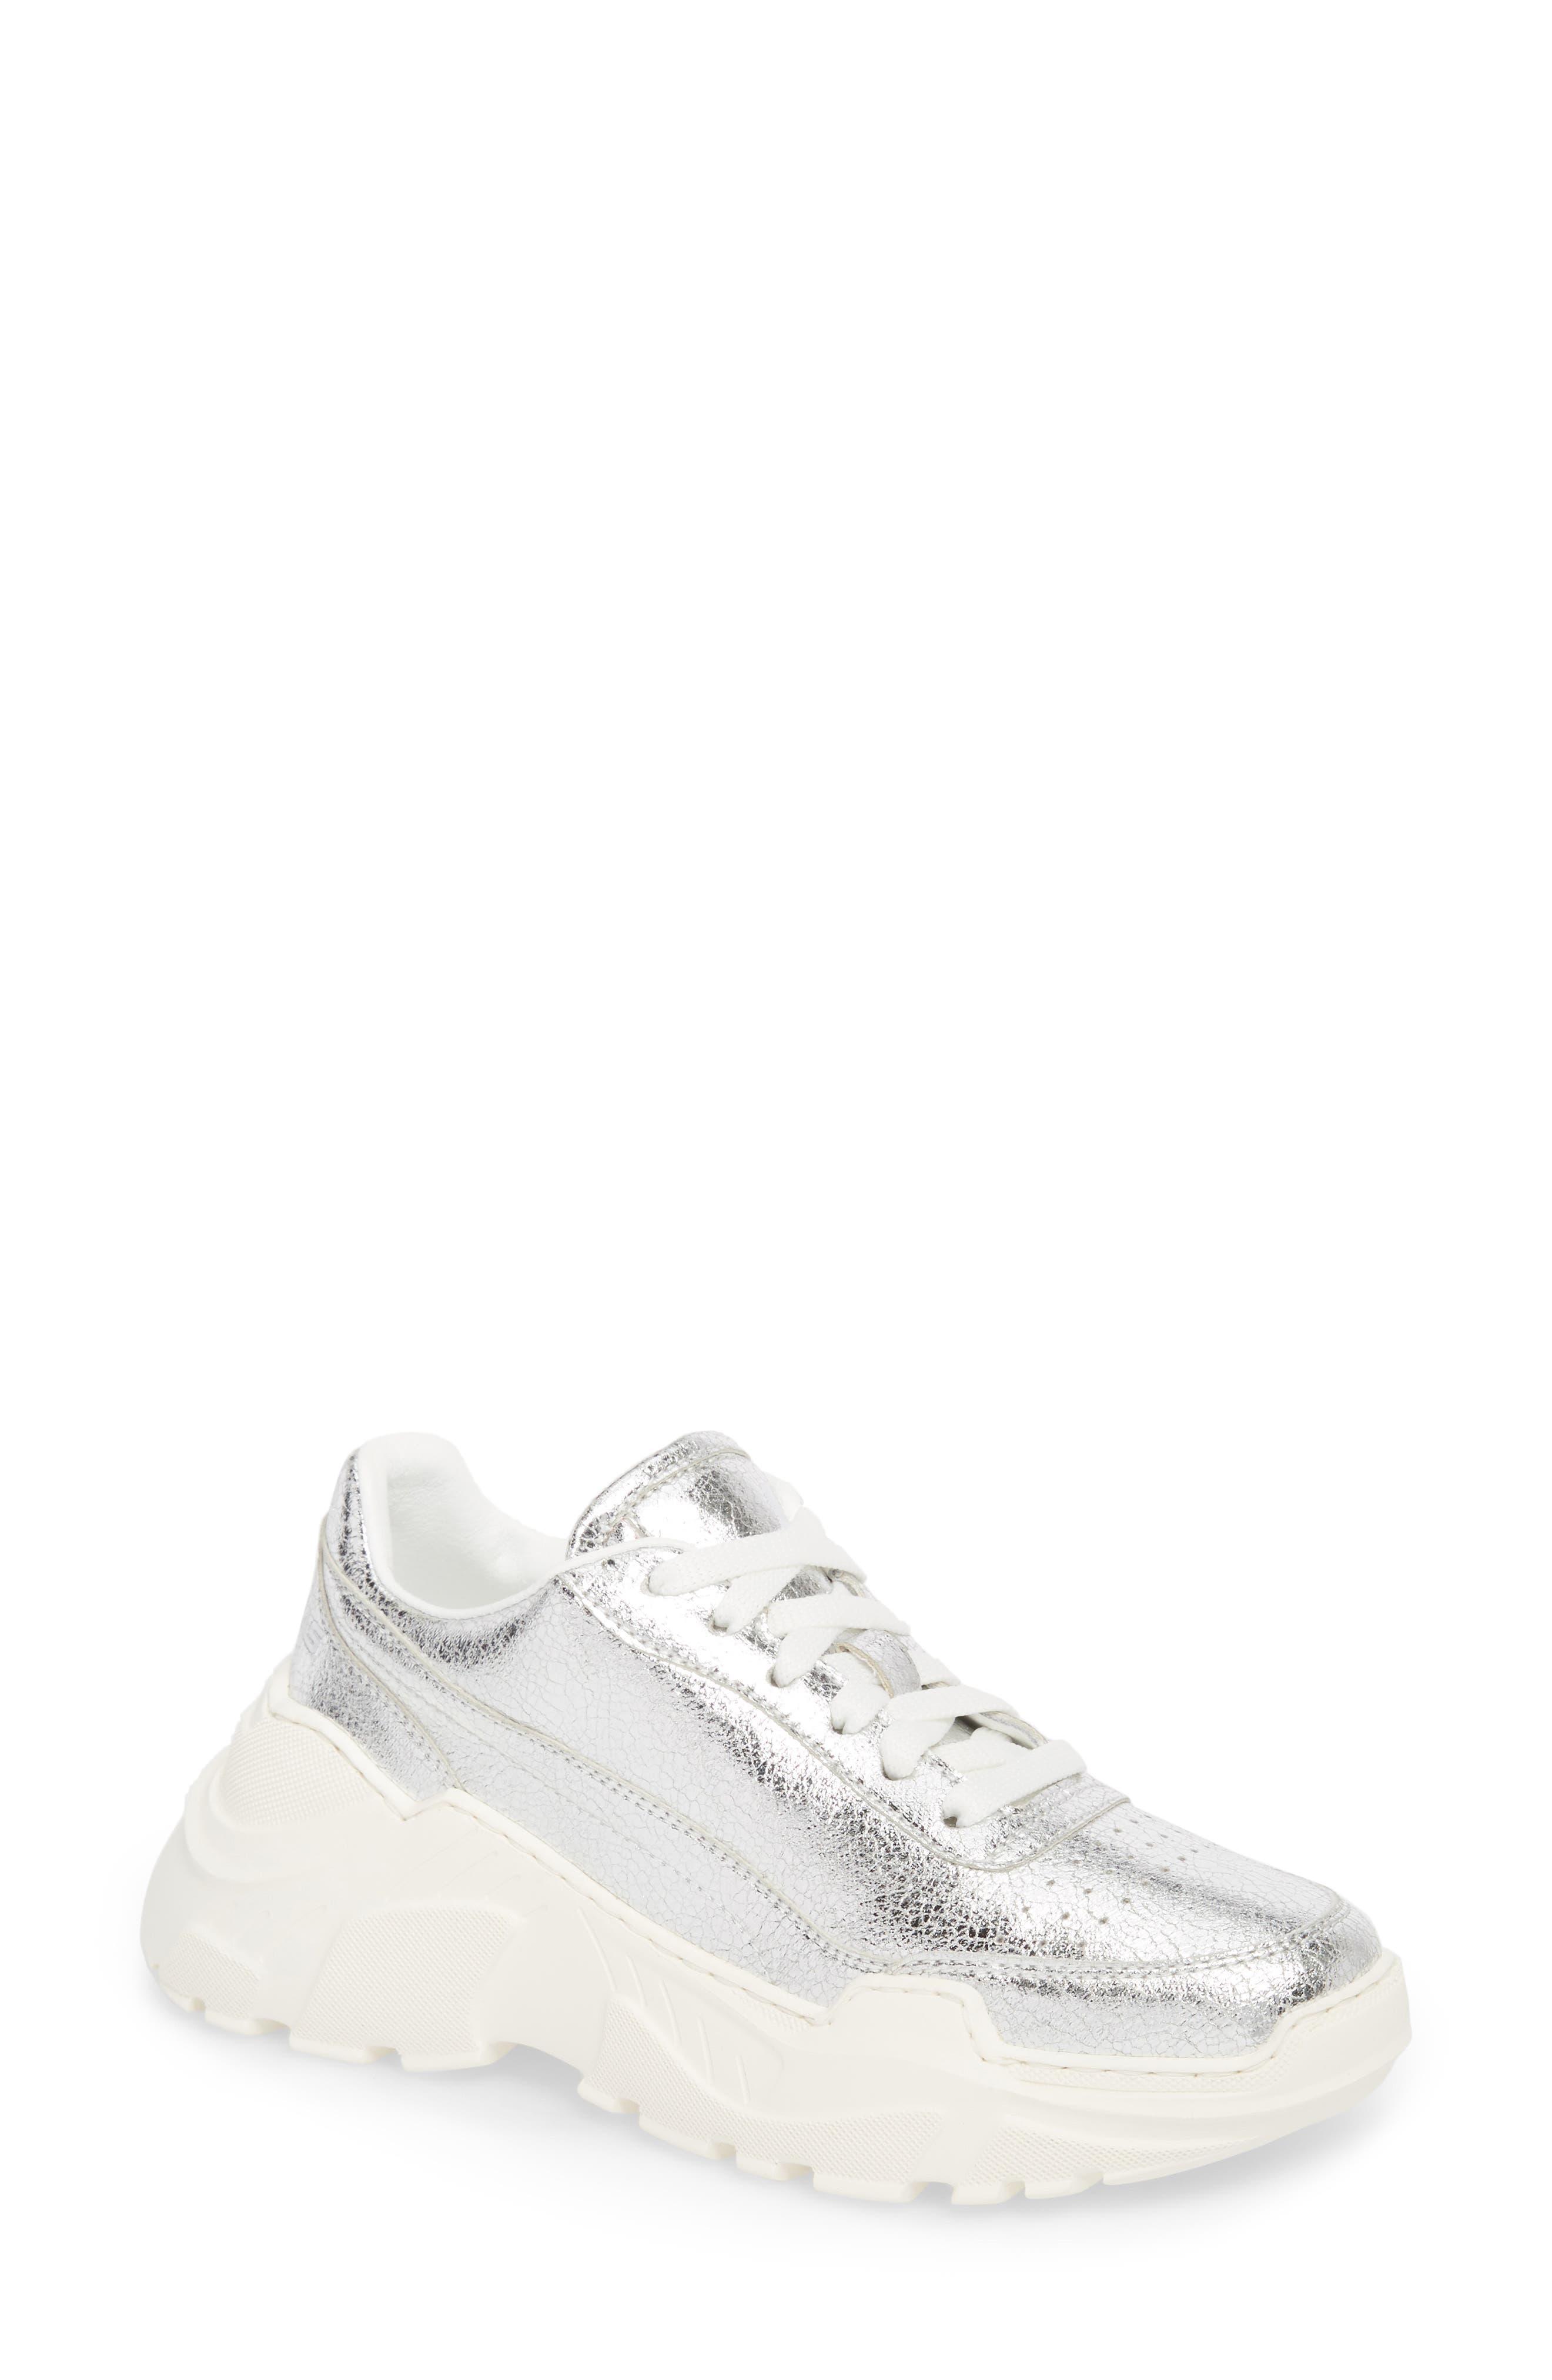 Zenith Sneaker,                             Main thumbnail 1, color,                             020